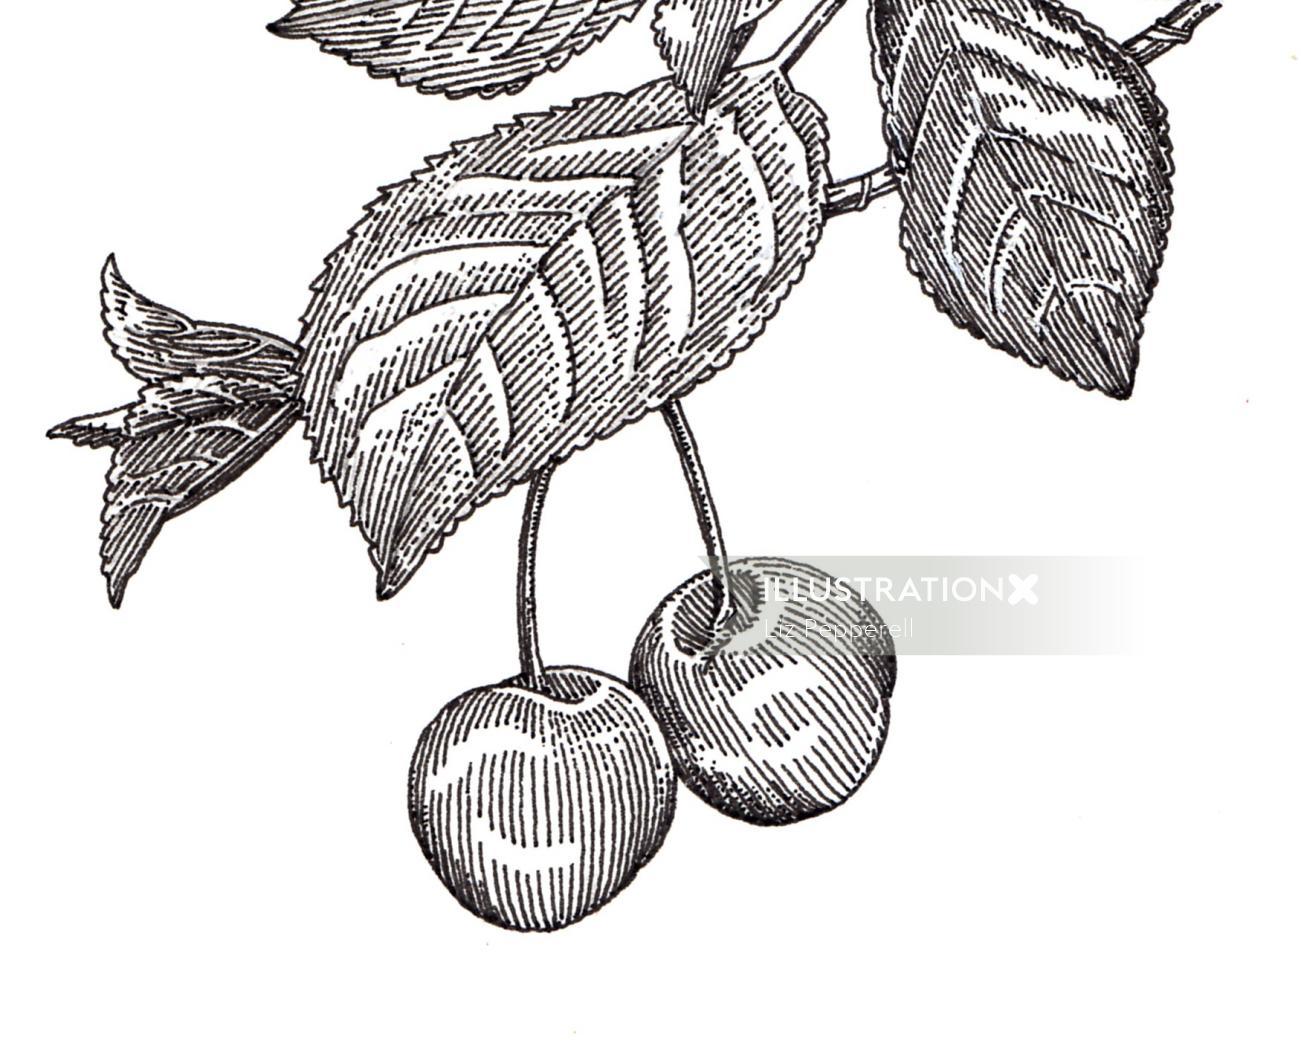 Black and white illustration of apple